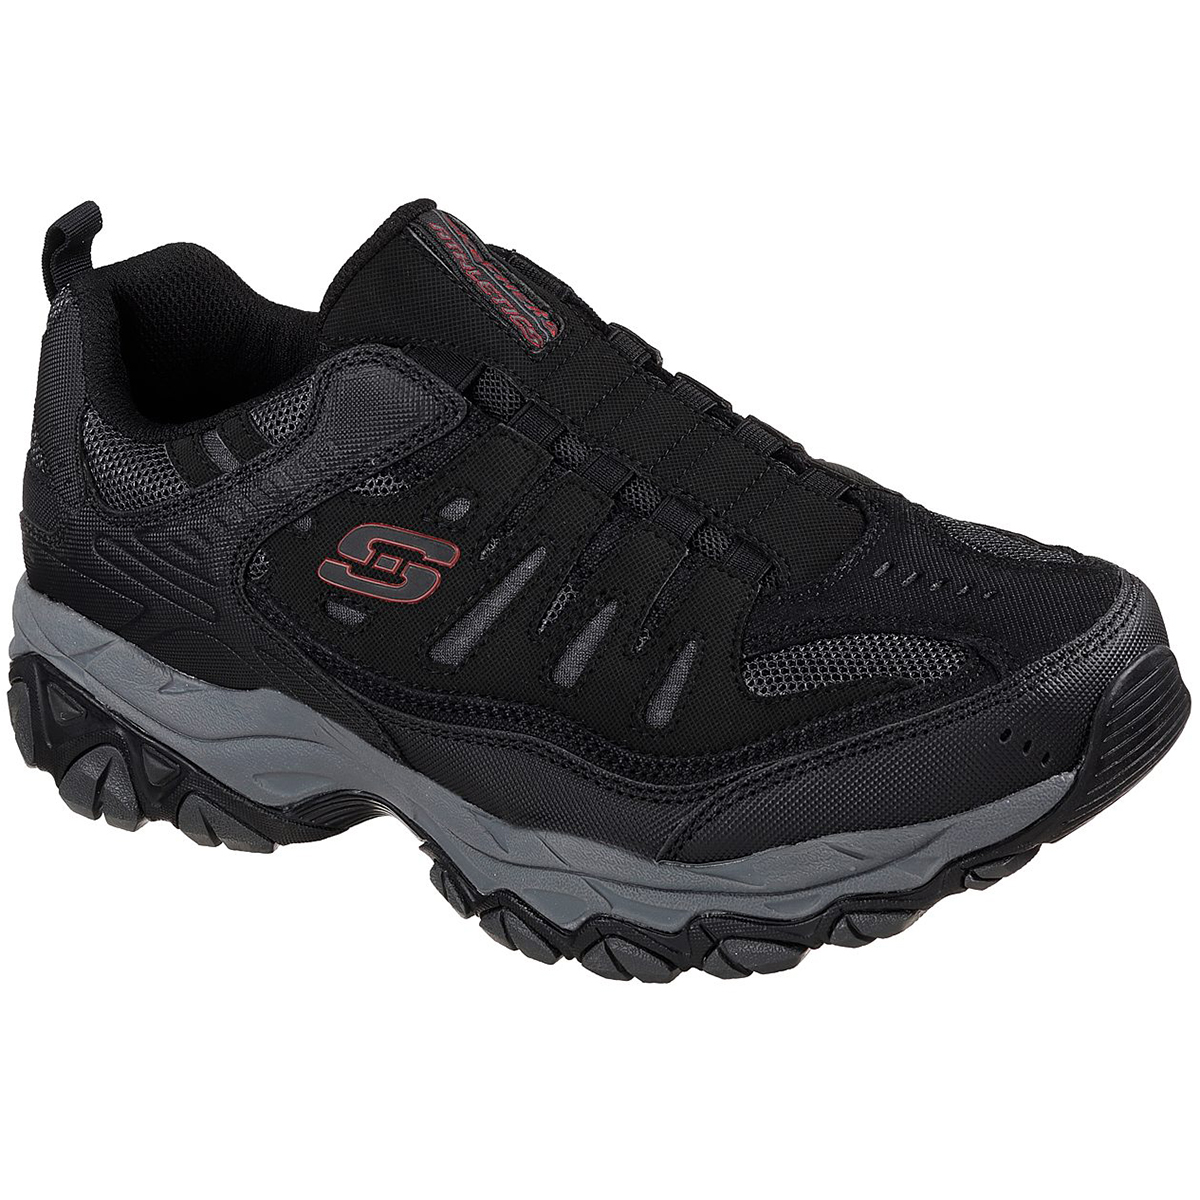 Skechers Men's After Burn-M. Fit Sneakers, Wide - Black, 12